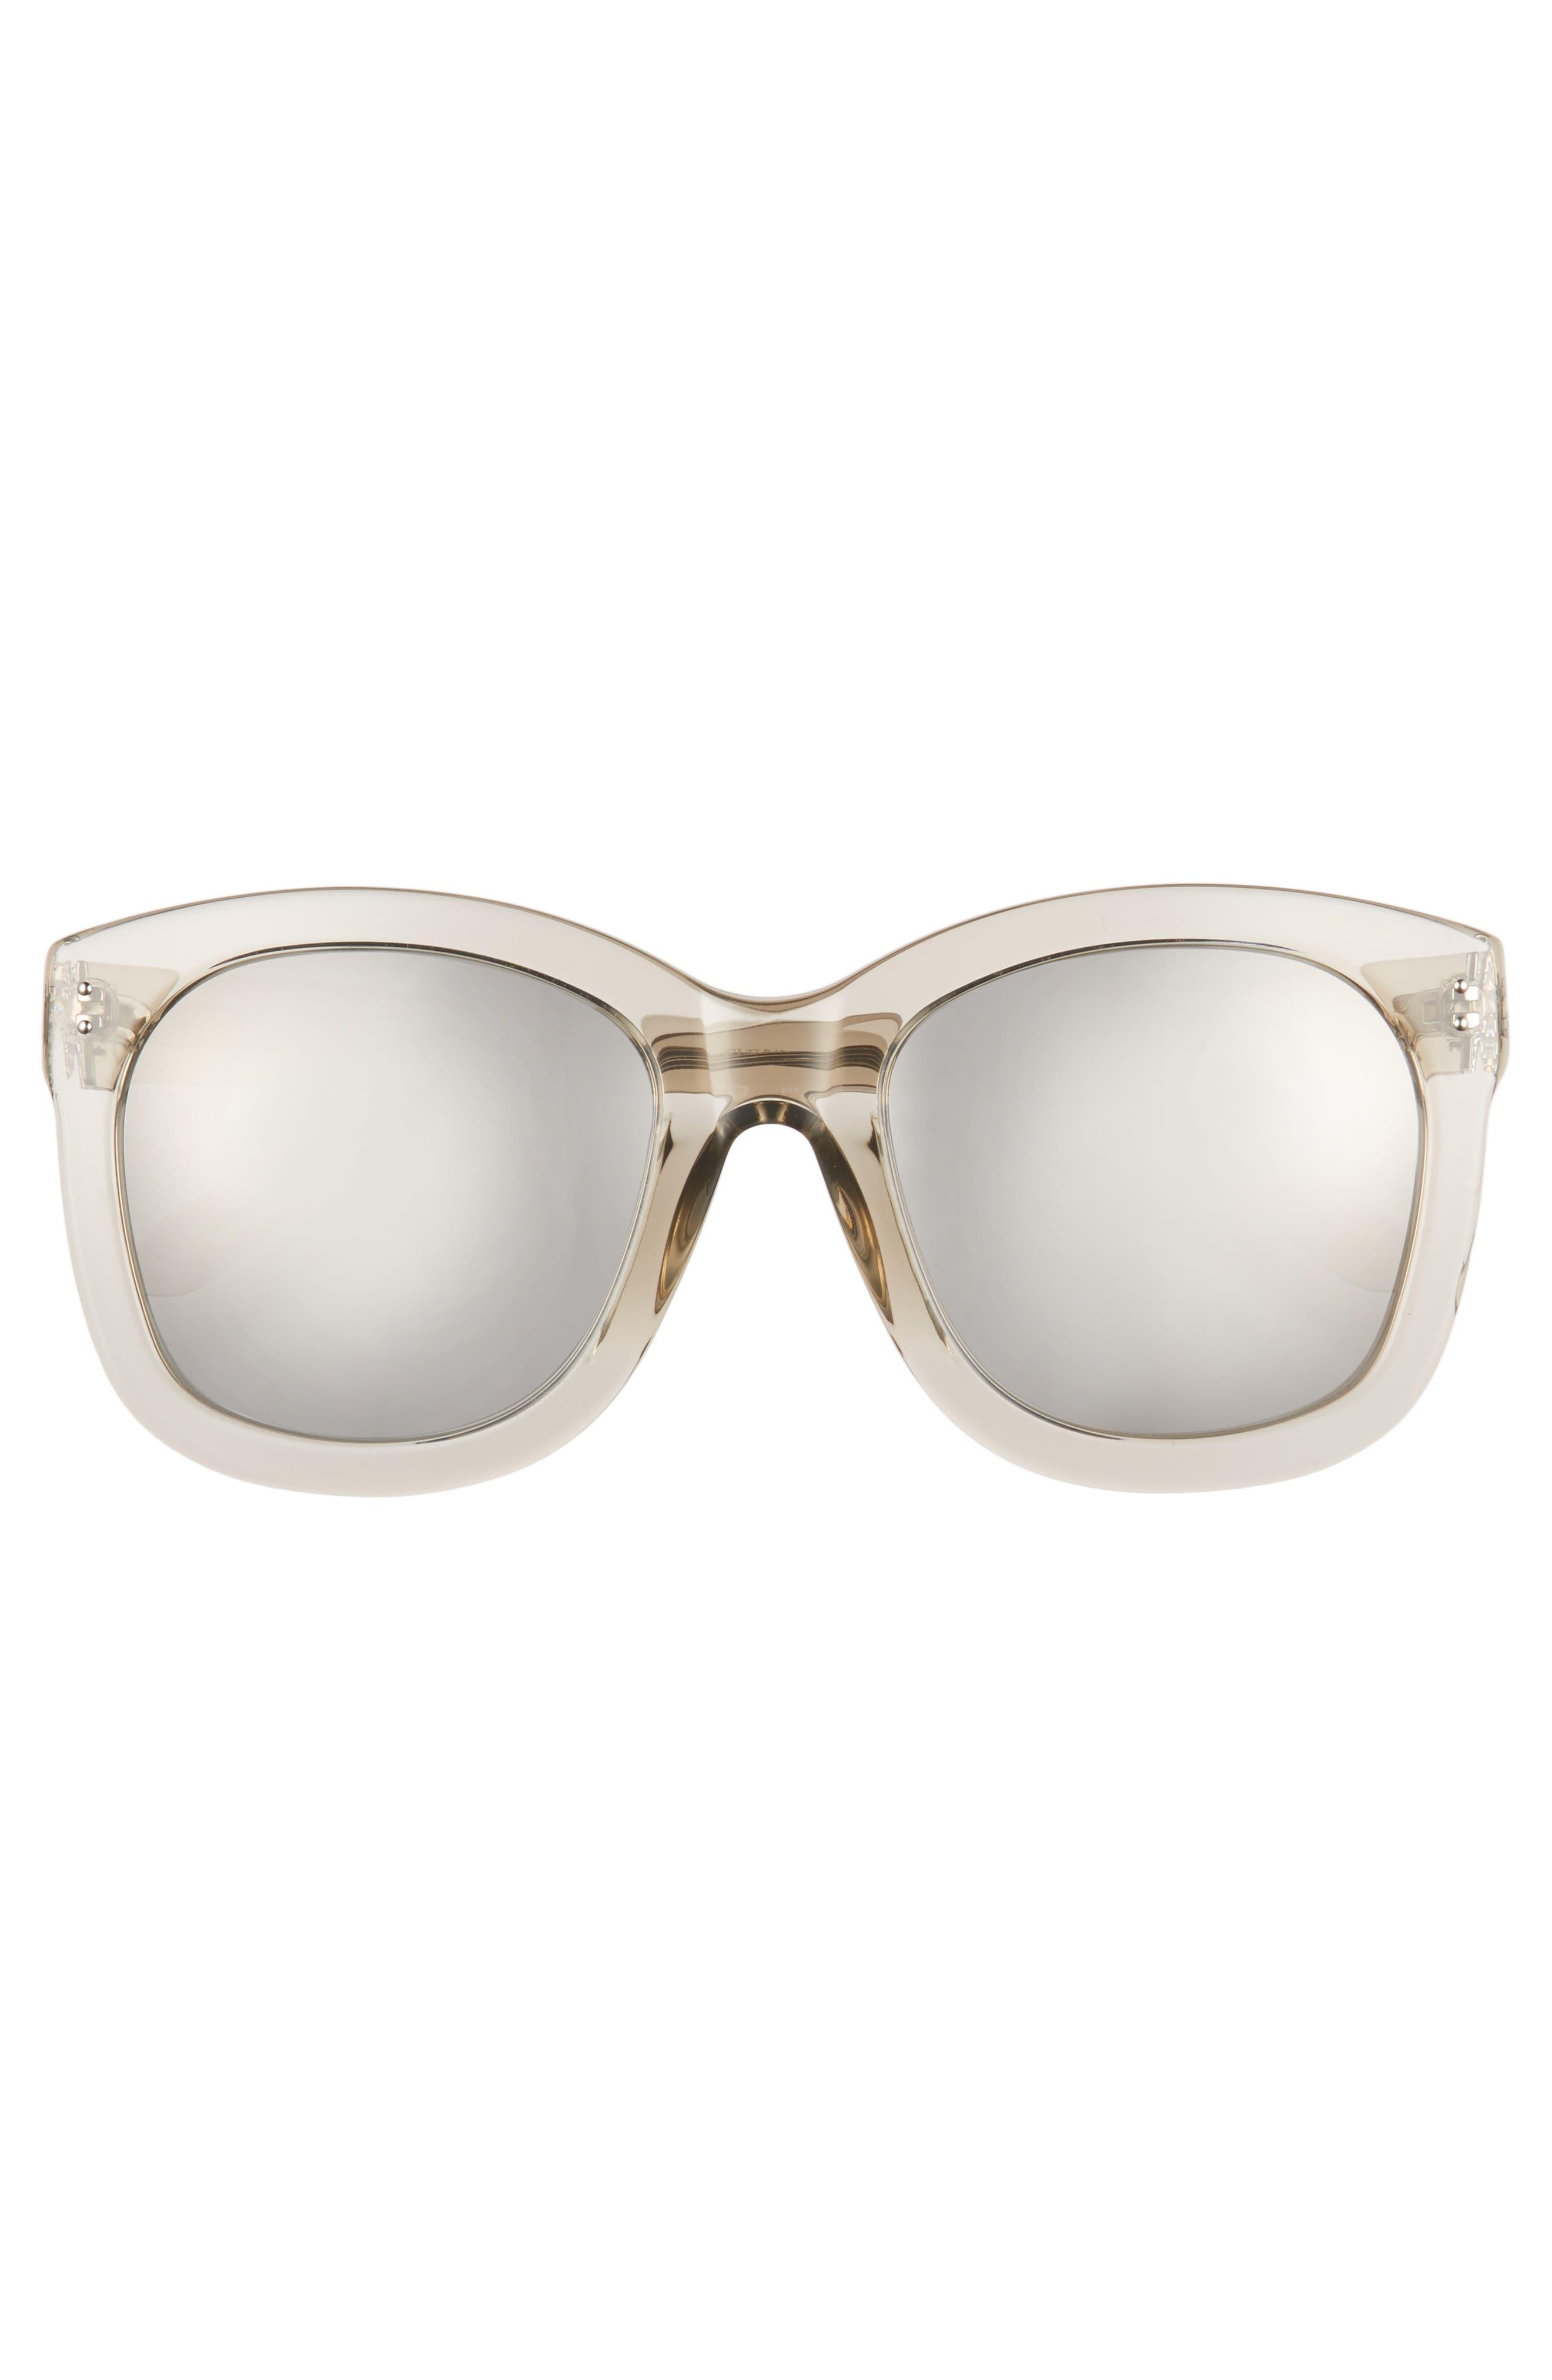 Alternate Image 3  - Linda Farrow 56mm Mirrored Sunglasses